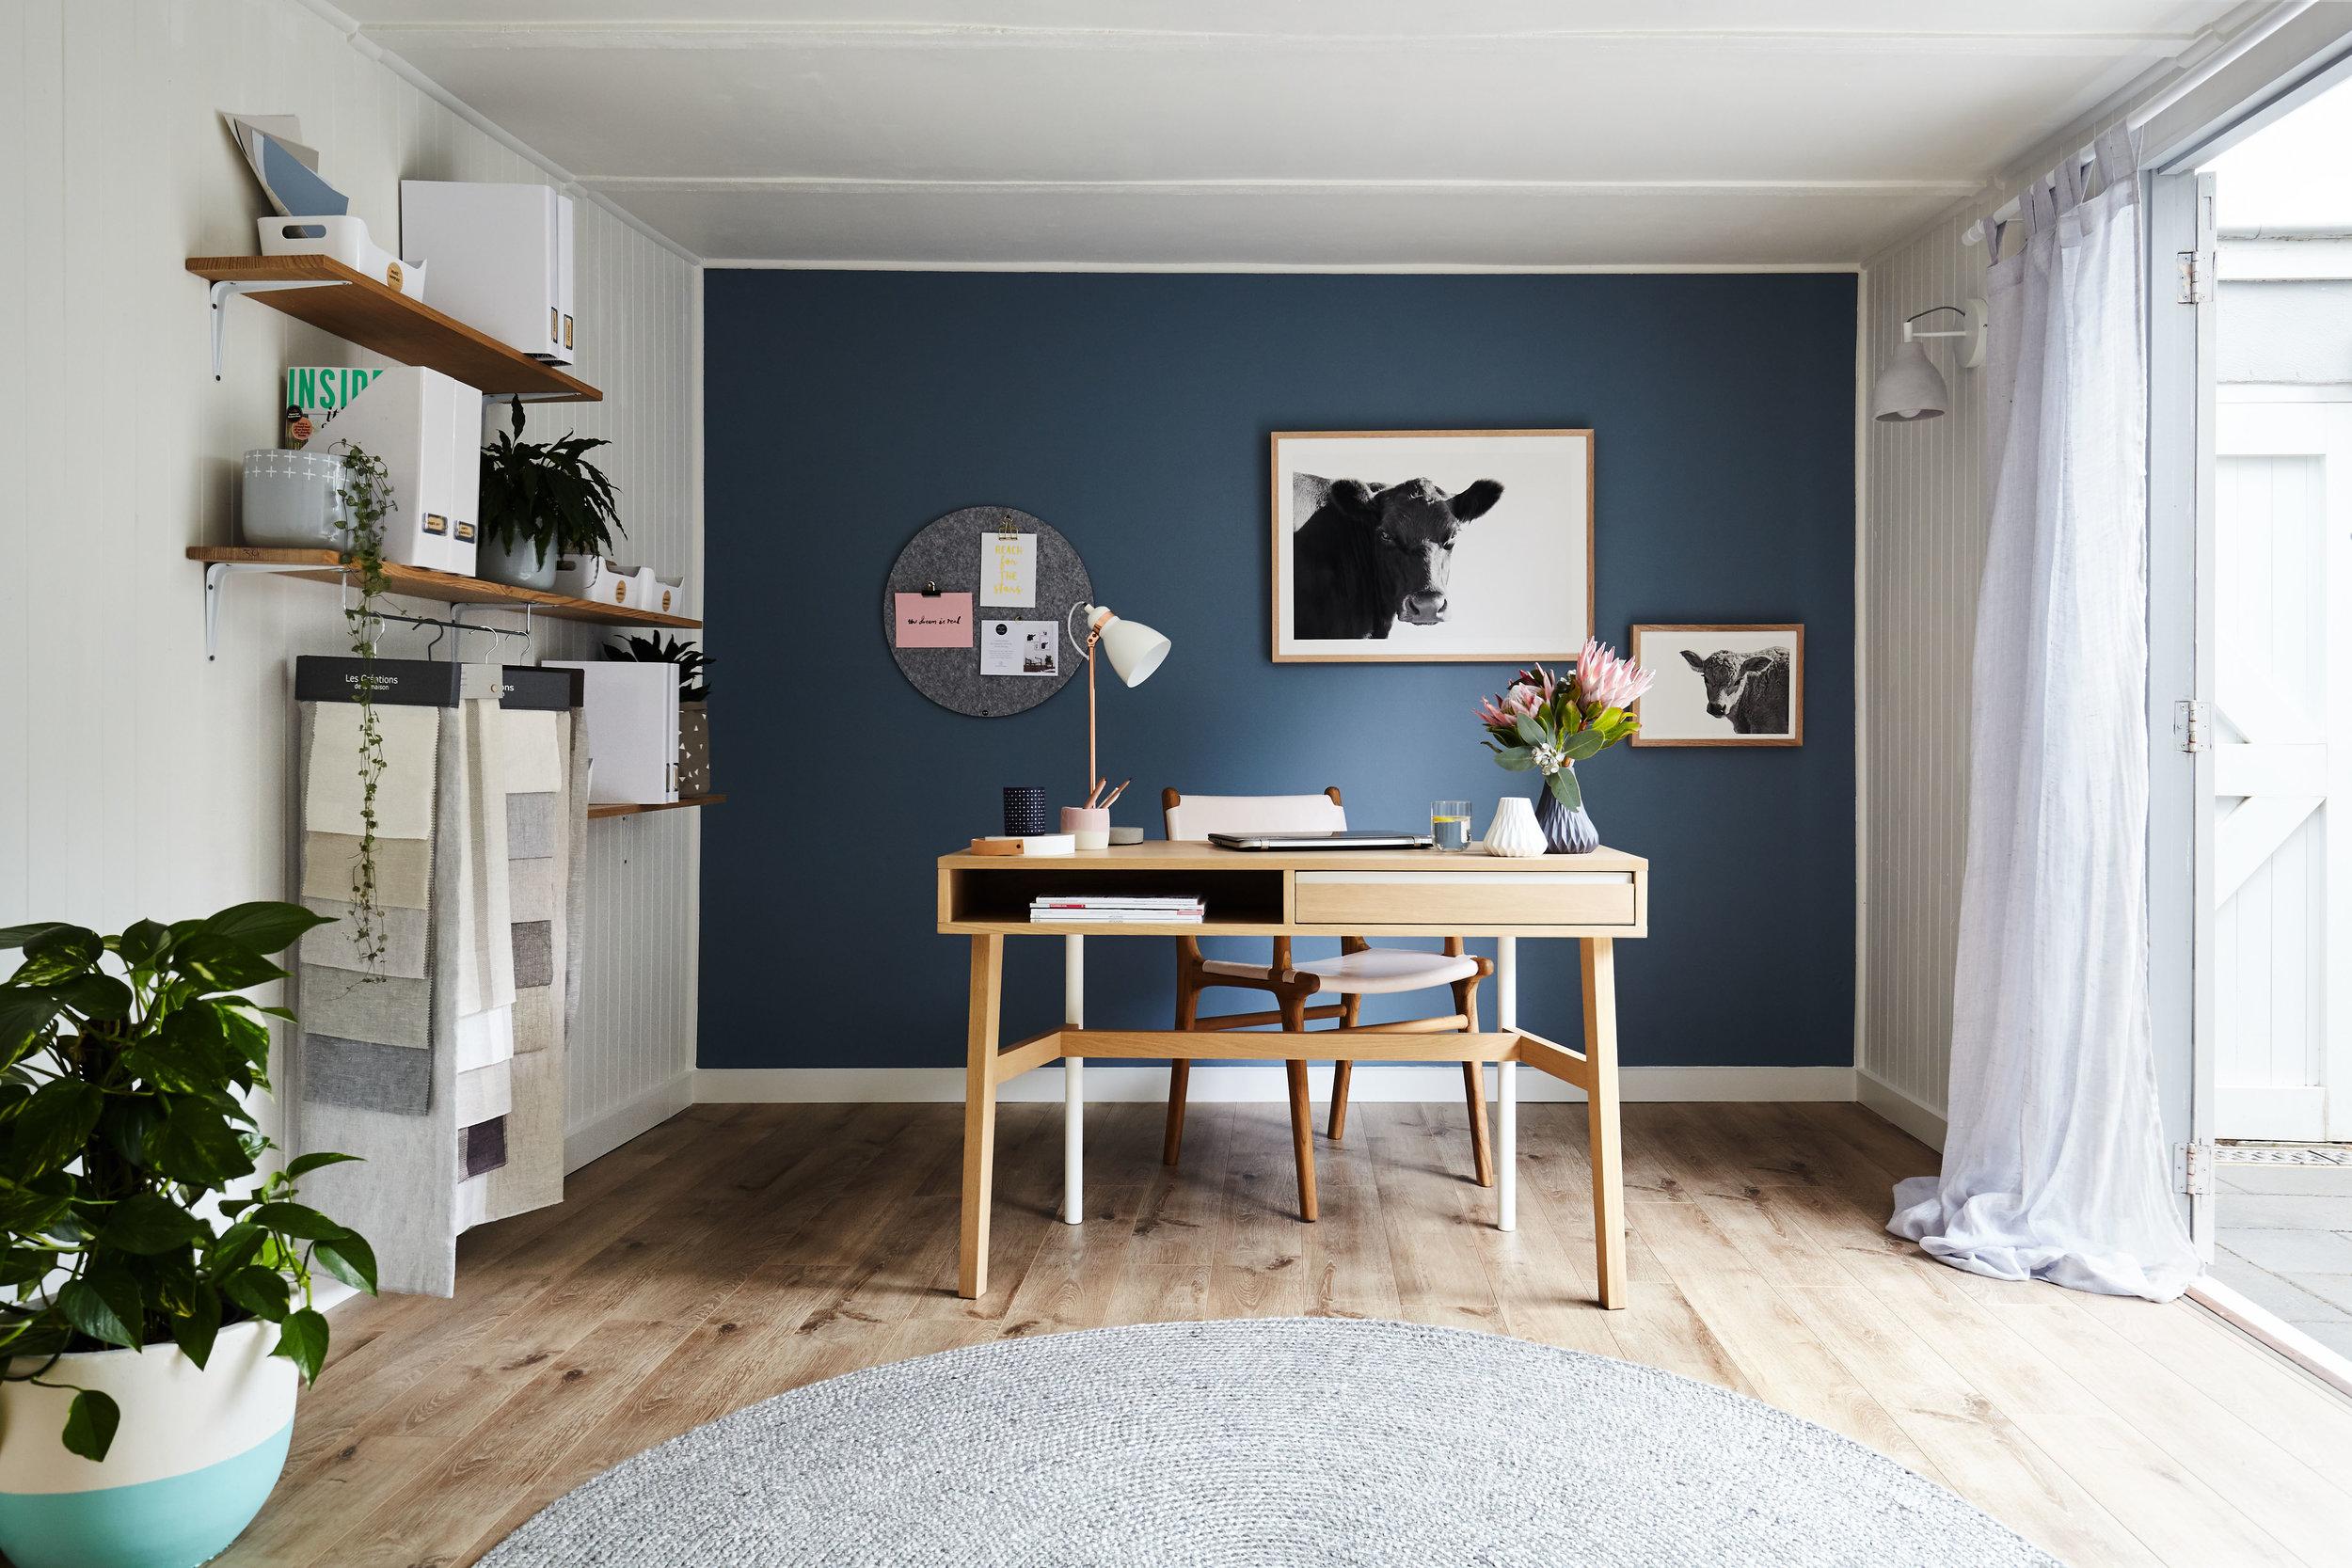 Maitland Street Interiors, Sarah Elshaug, Interior Decorator Melbourne, The MSI Studio, Home Office, Interior Stylist Melbourne